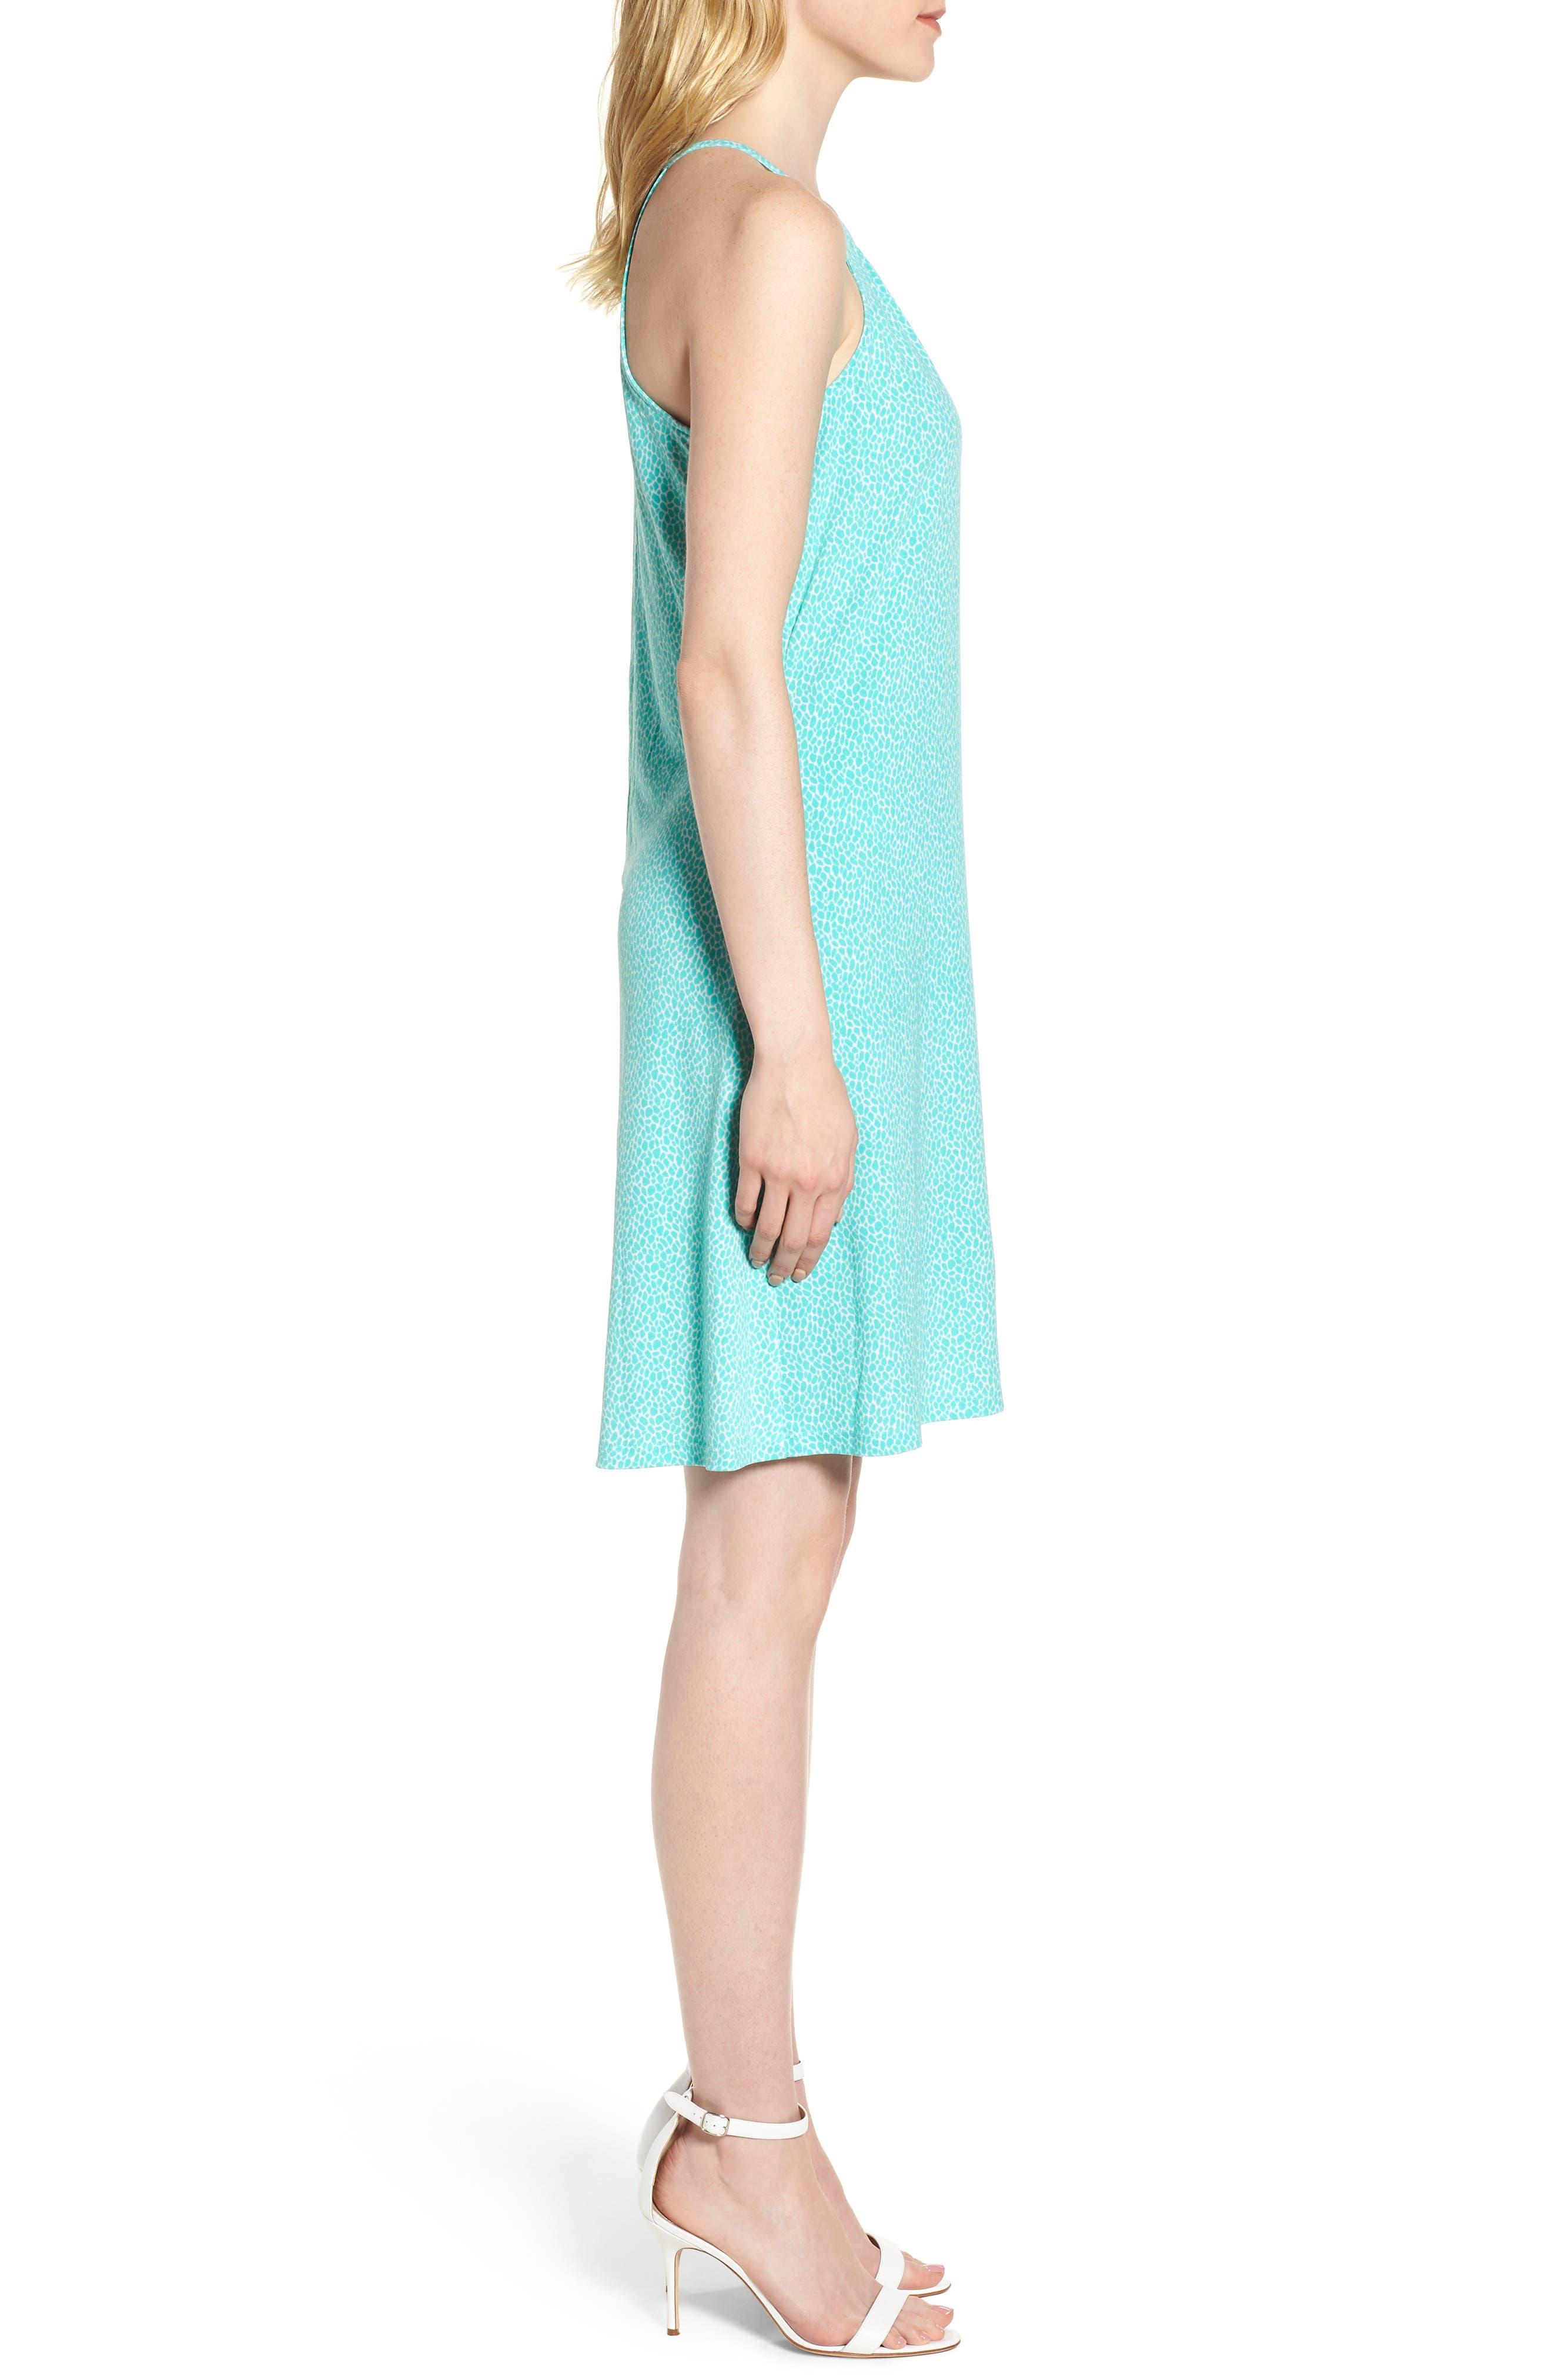 Leo Halter Top Mini Dress,                             Alternate thumbnail 3, color,                             199